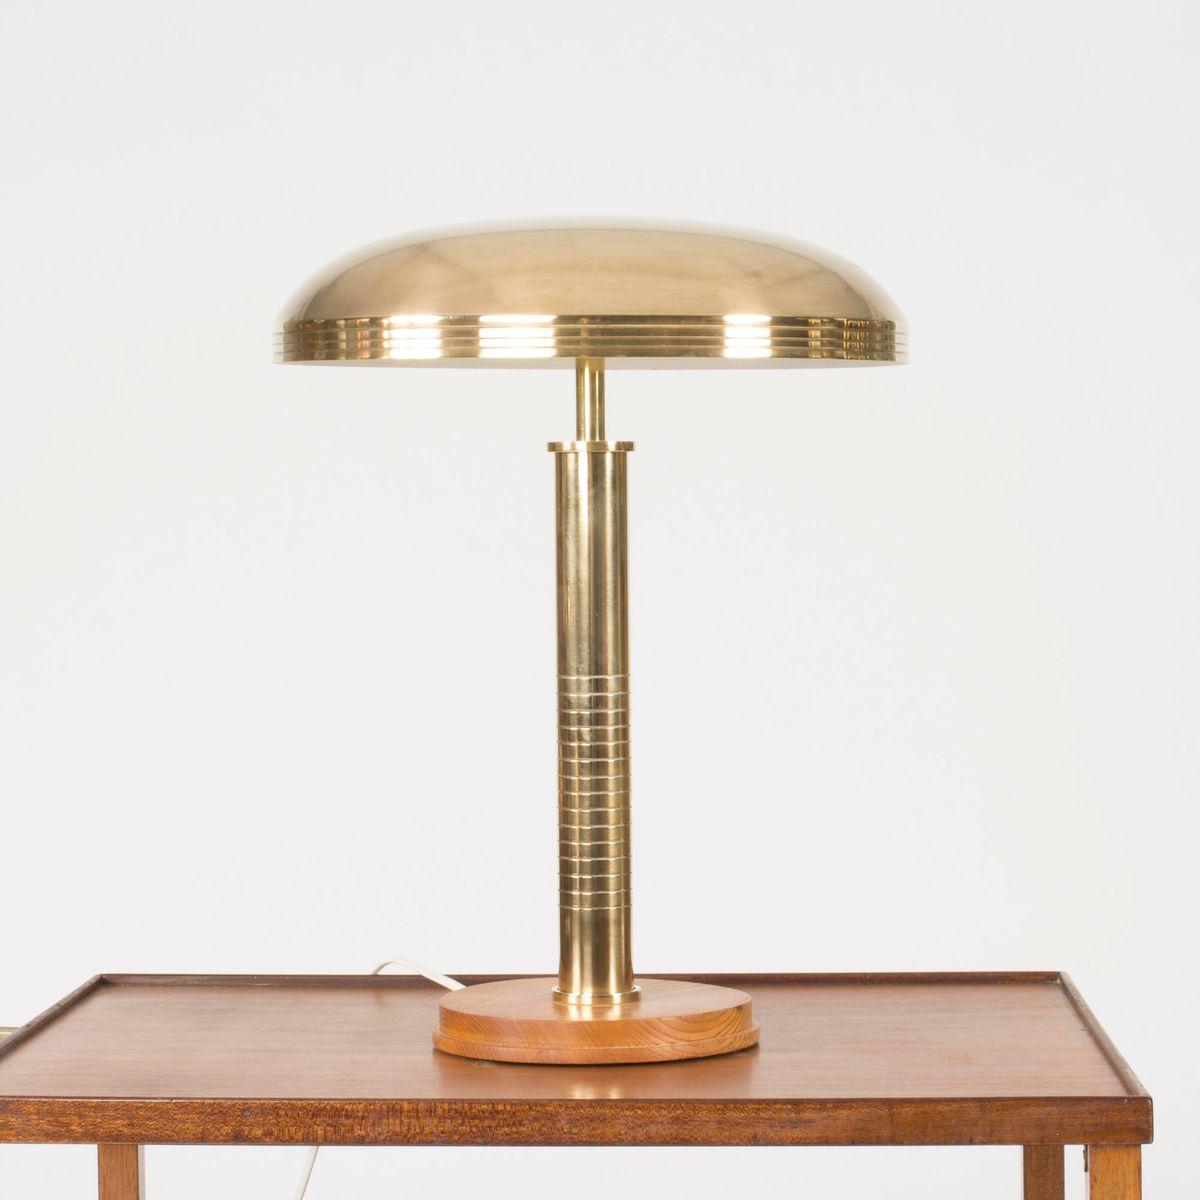 lampe de bureau en laiton de b hlmarks 1940s en vente sur pamono. Black Bedroom Furniture Sets. Home Design Ideas